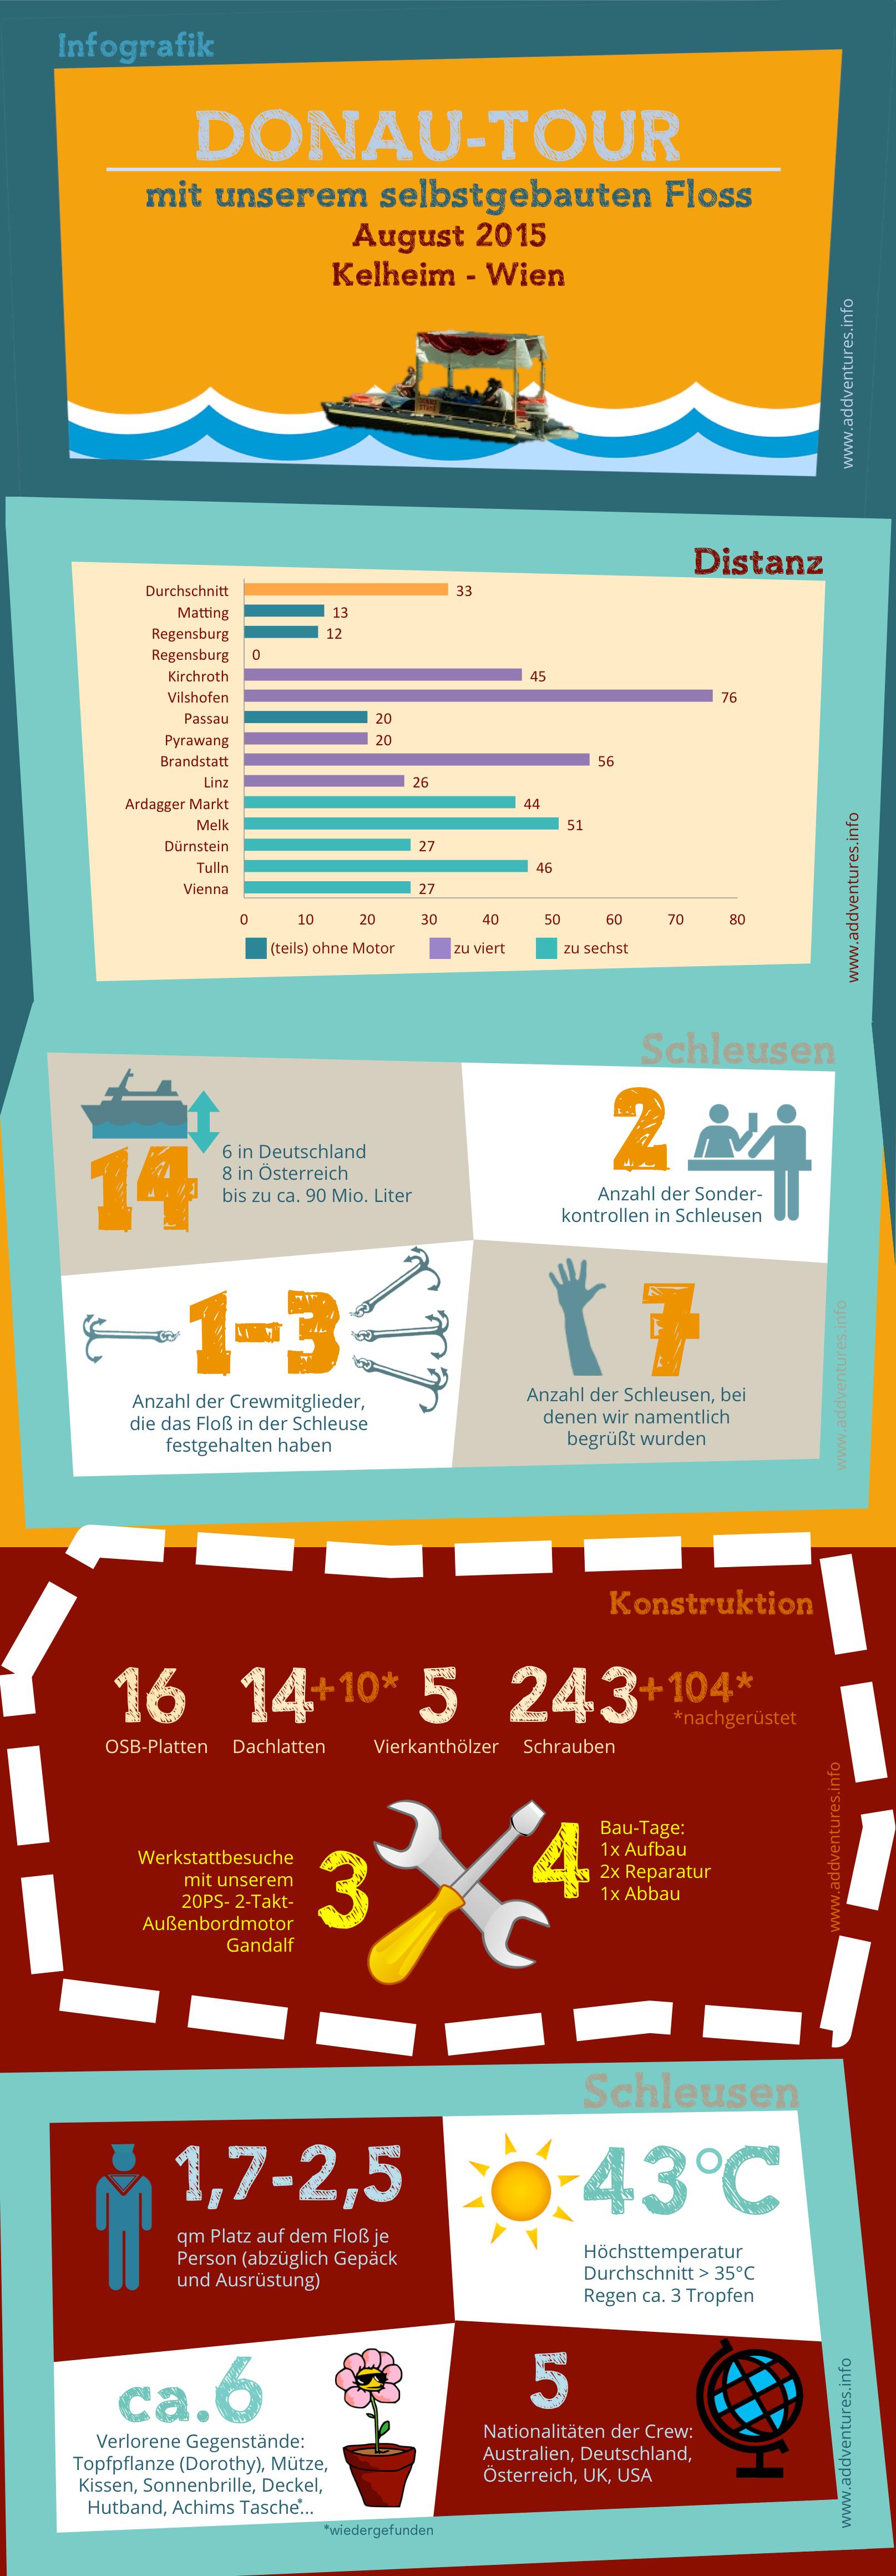 Donau Floßfahrt Infografik